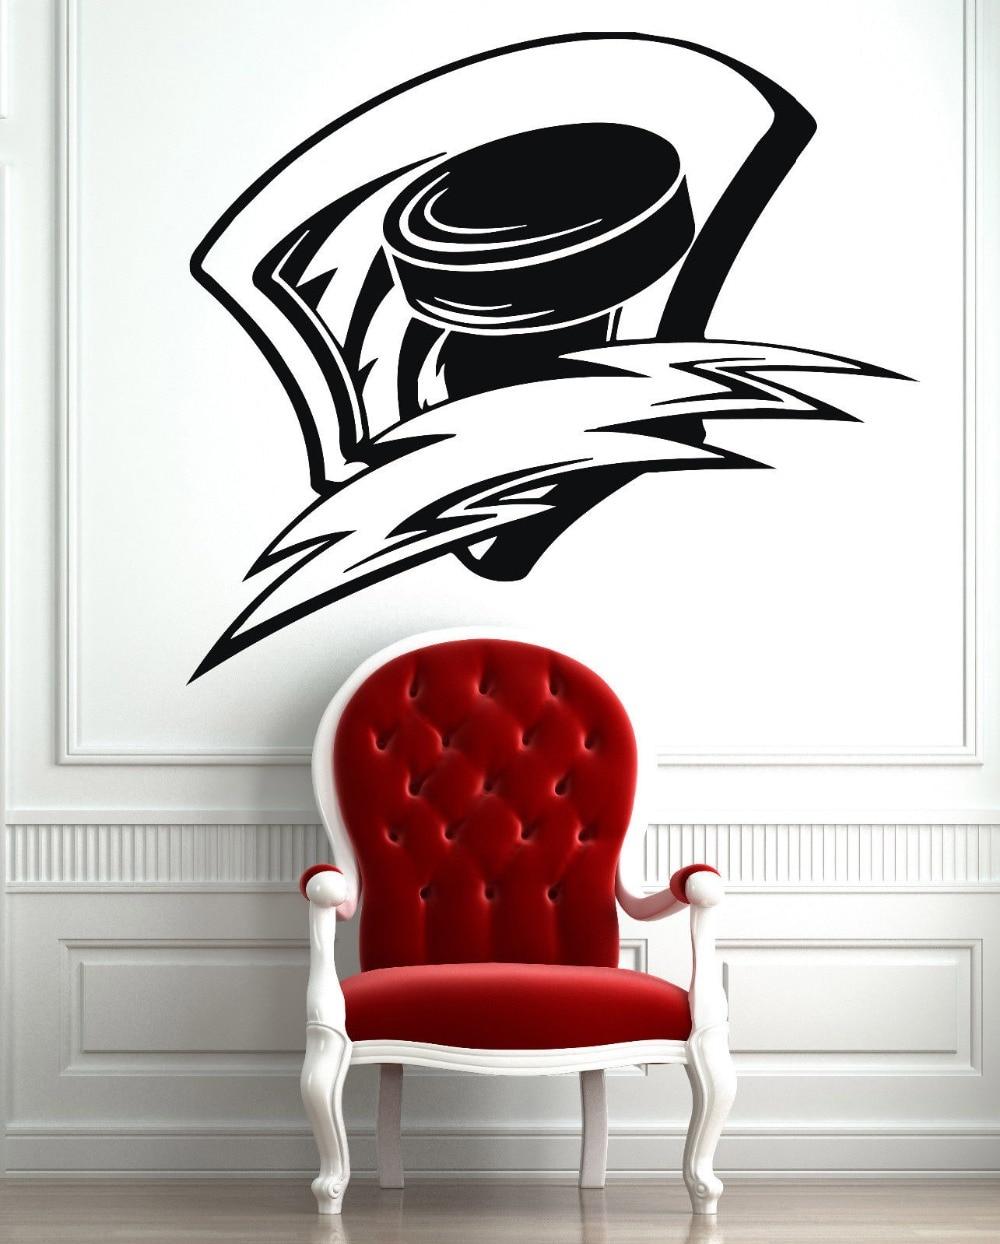 Hockey wall mural choice image home wall decoration ideas hockey wall mural  choice image home wall